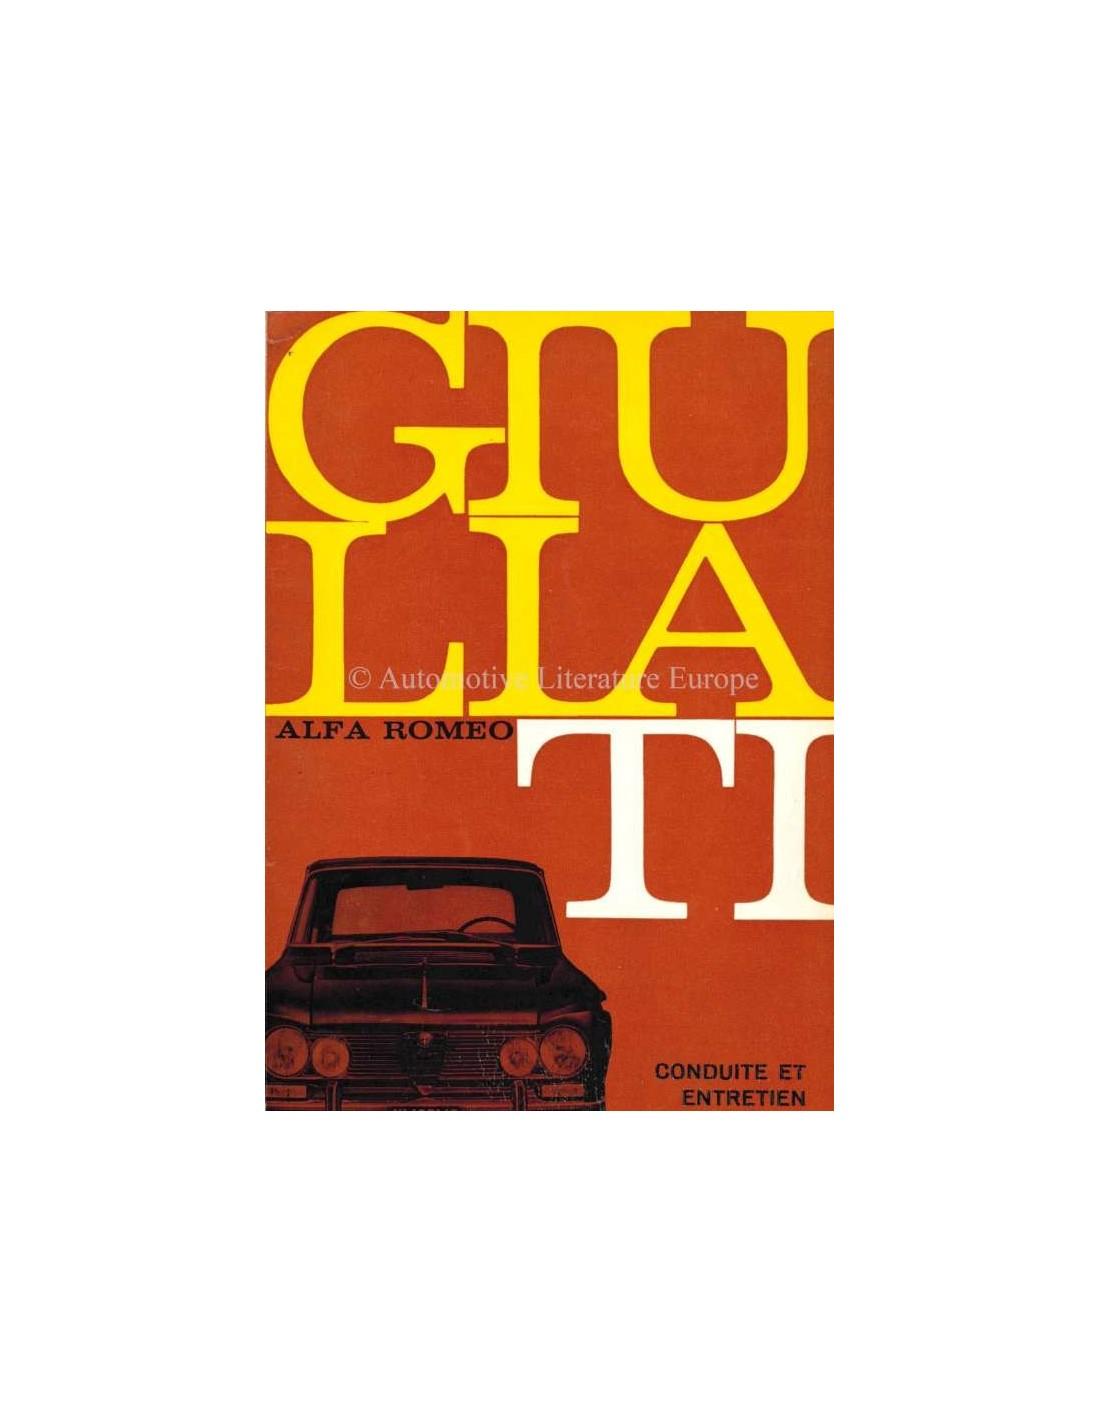 1965 ALFA ROMEO GIULIA 1600 TI INSTRUCTIEBOEKJE FRANS